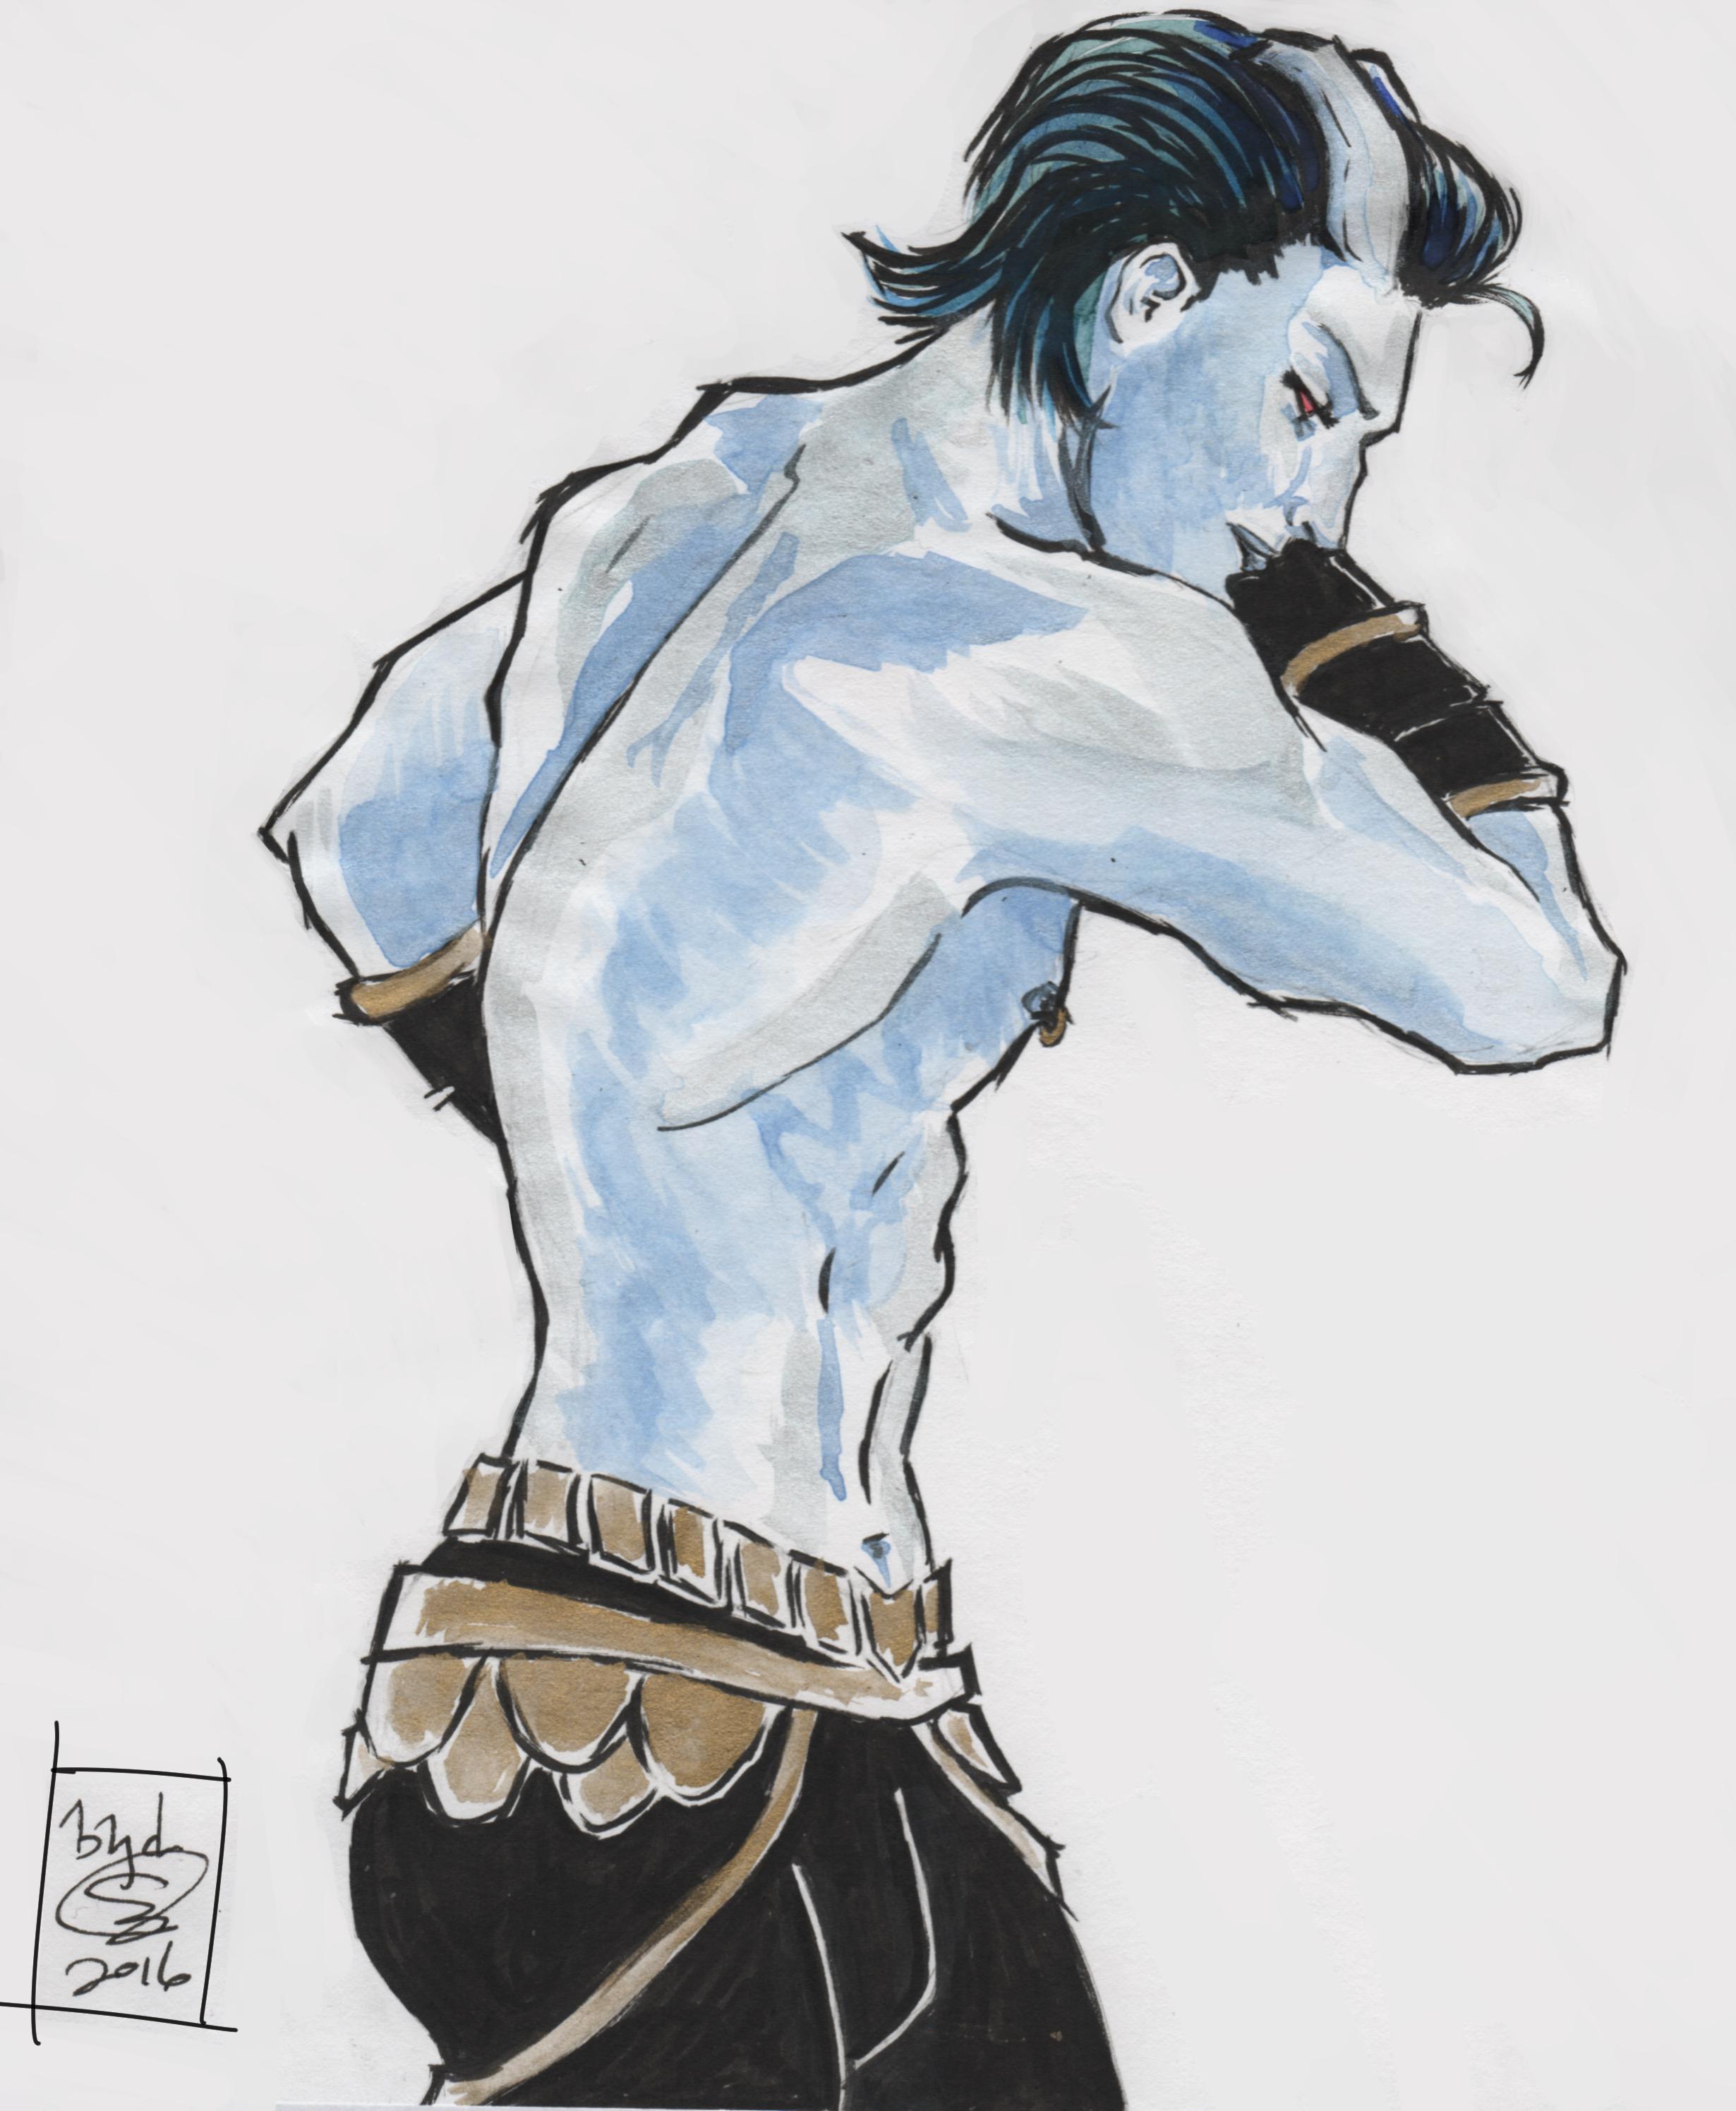 Avengers Academy Frost Giant Loki